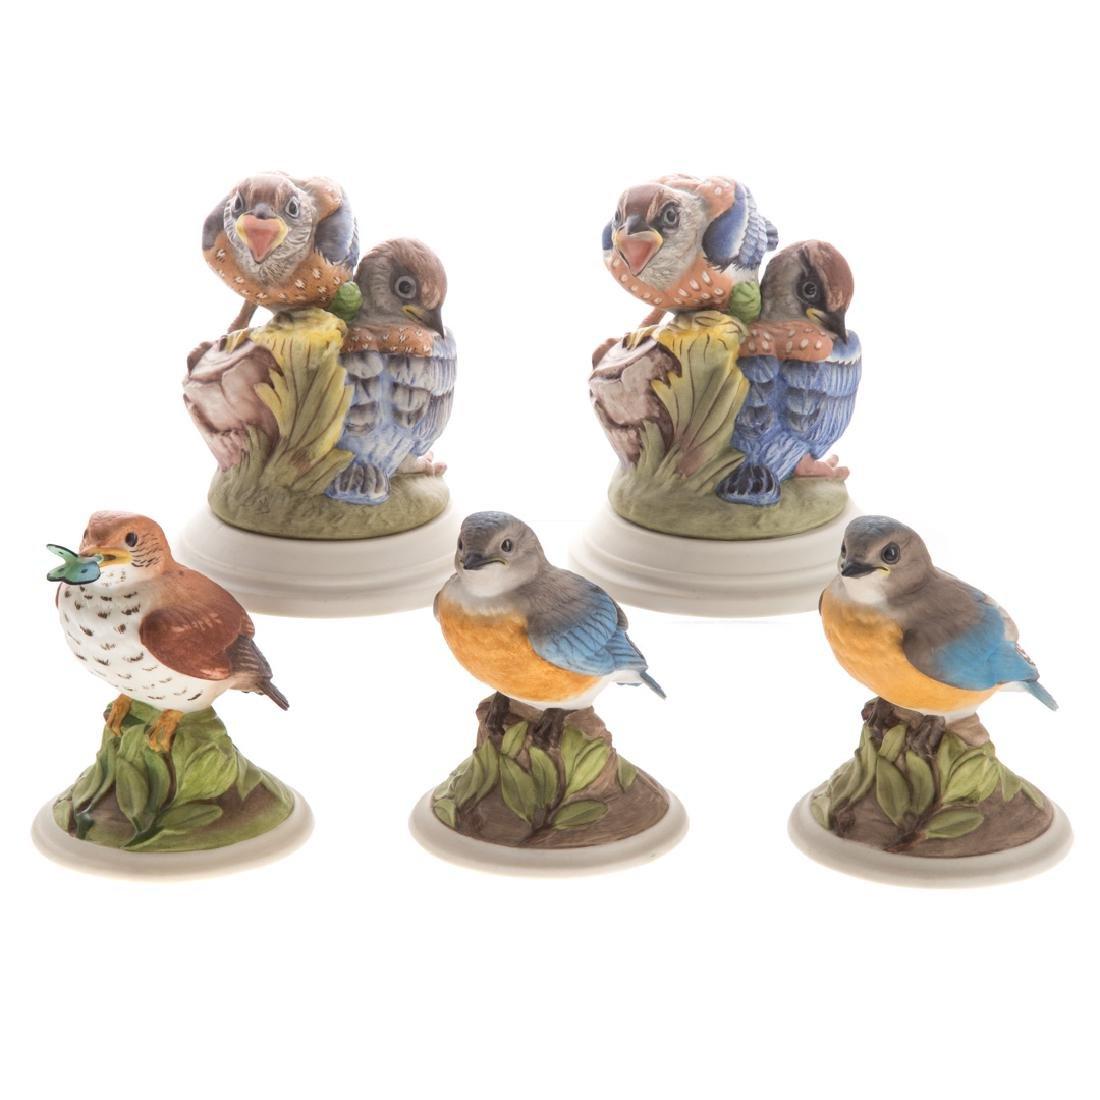 Five Boehm bisque baby/fledging birds